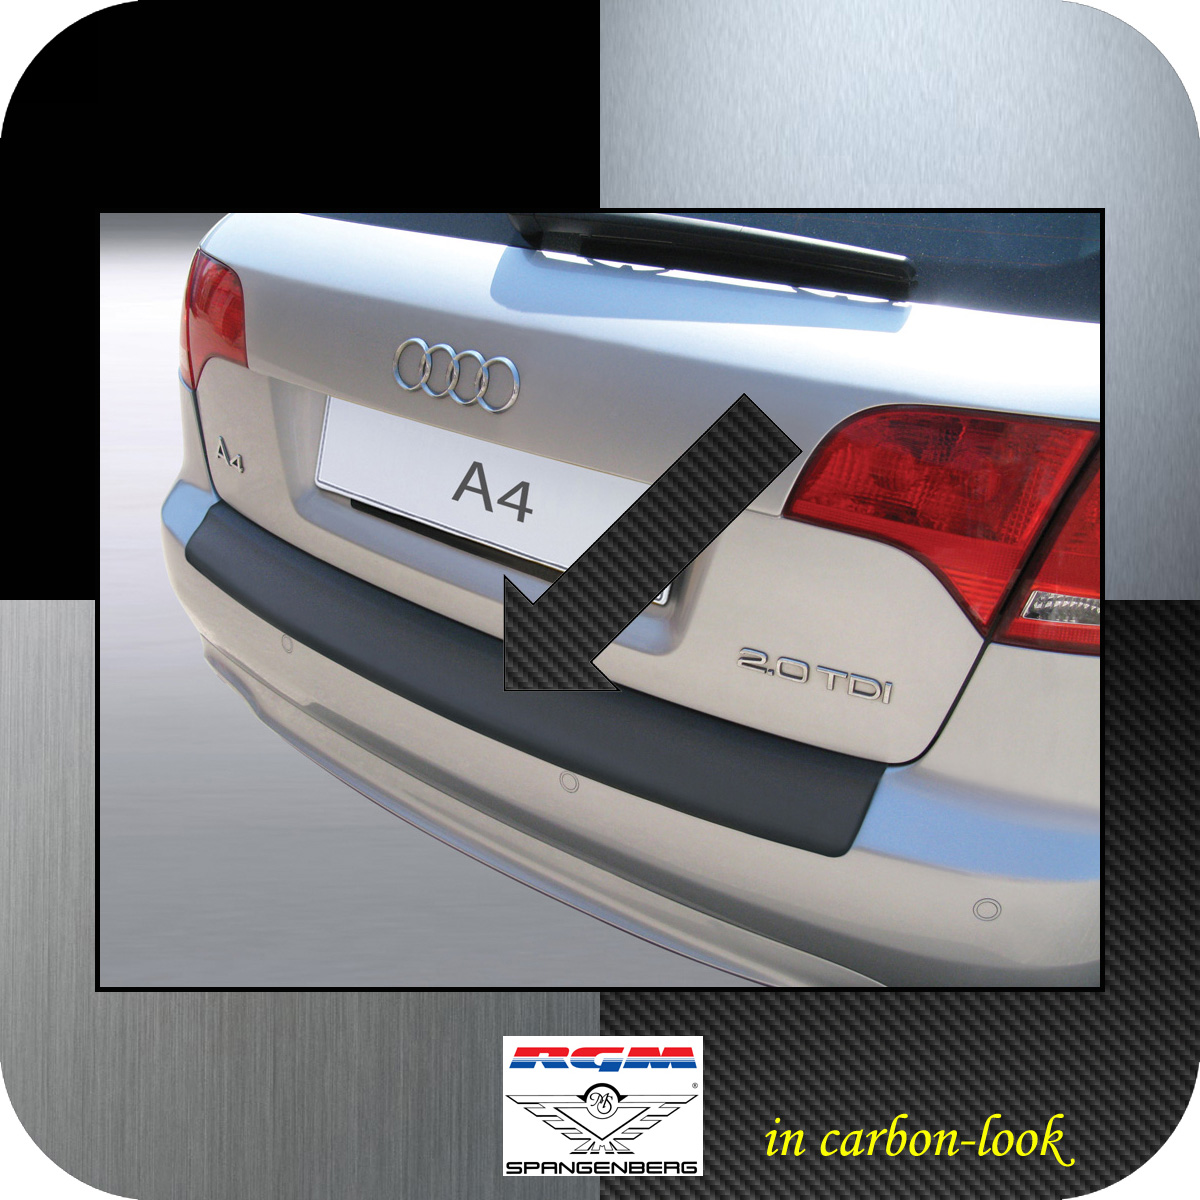 Ladekantenschutz Carbon-Look Audi A4 B7 Avant Kombi auch S-Line 2004-08 3509462